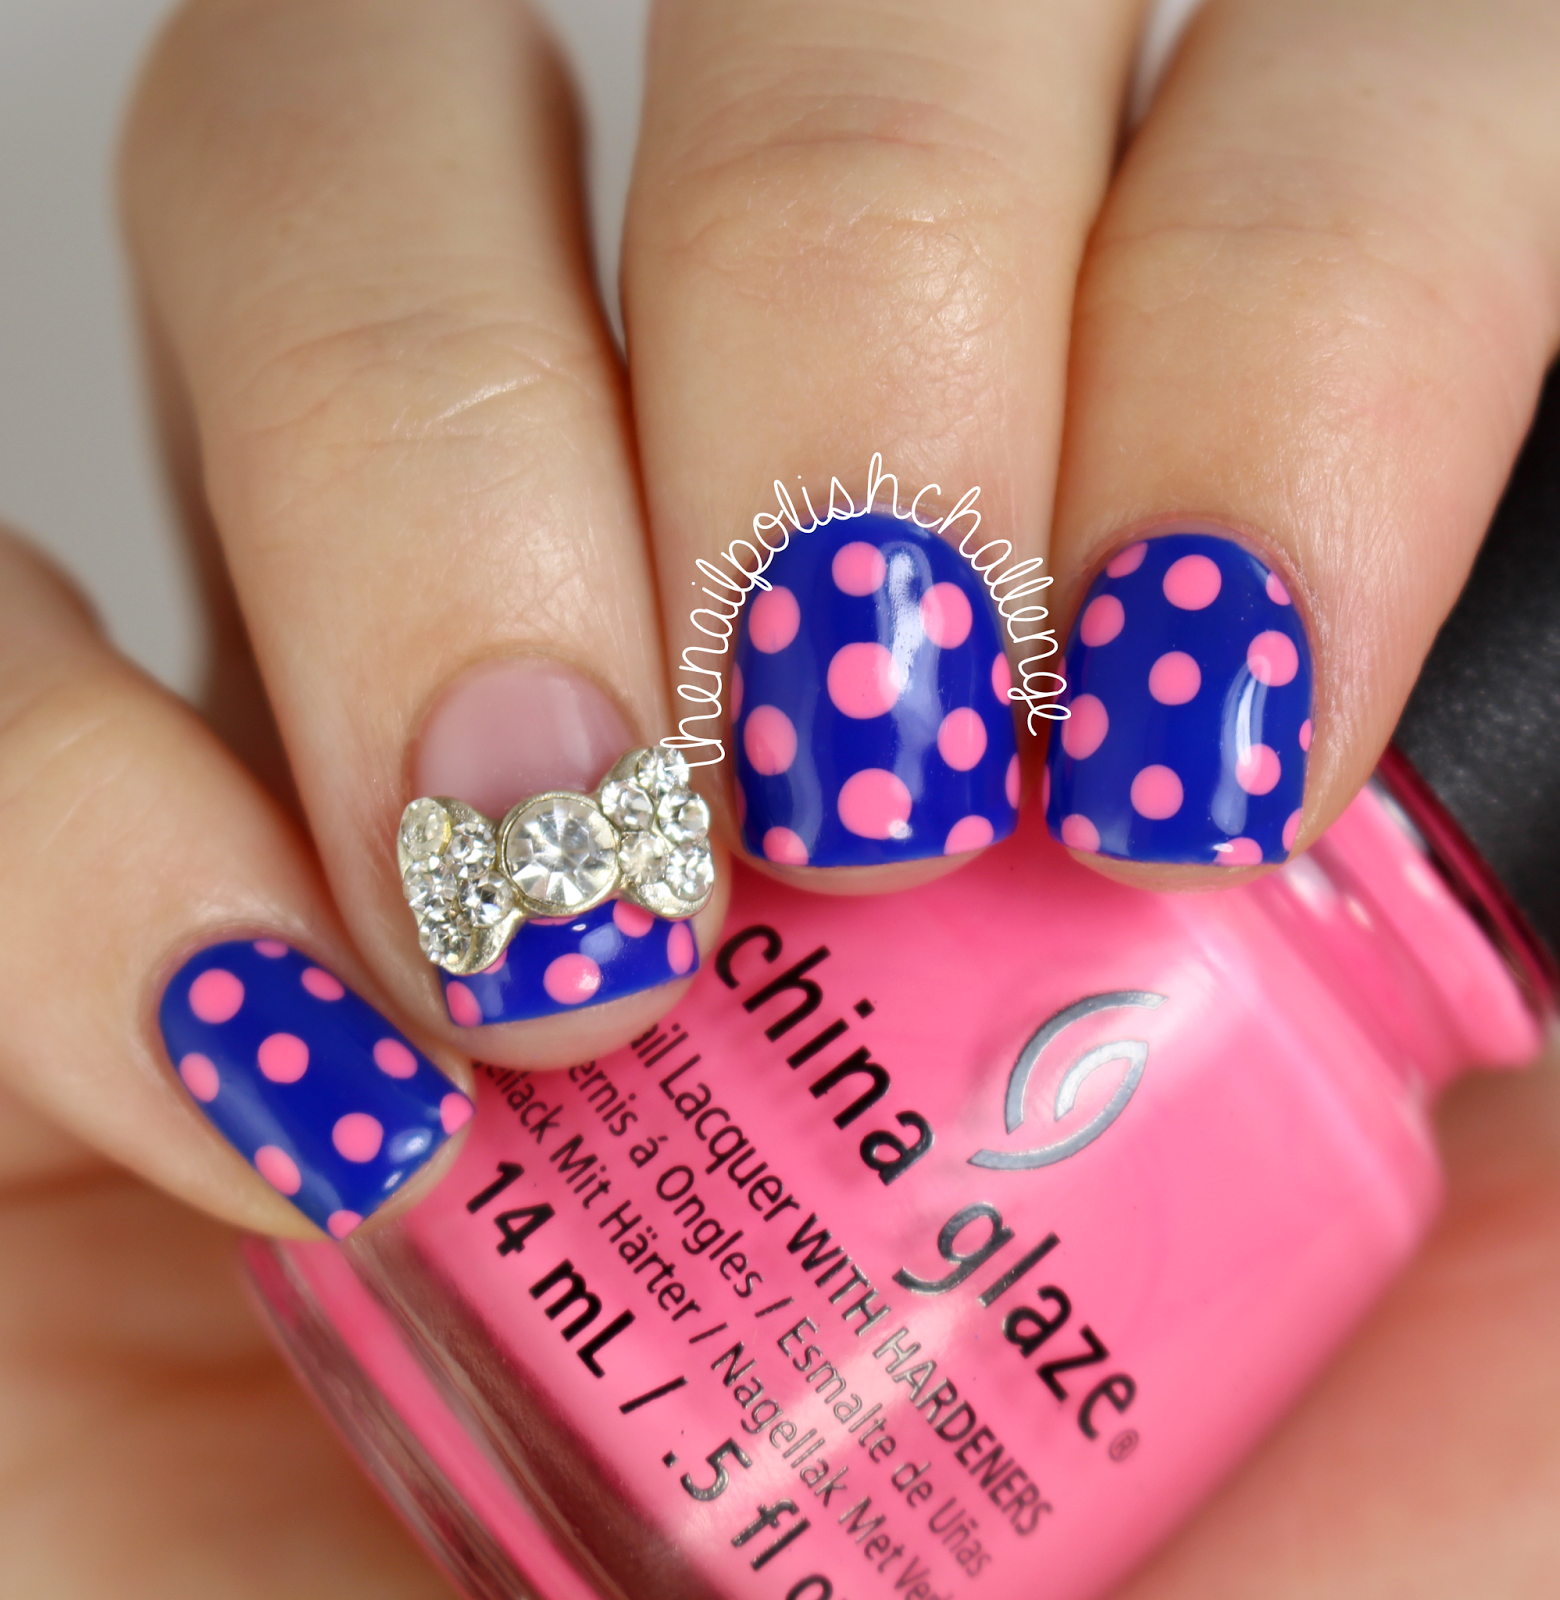 the nail polish challenge | Nails art | Pinterest | Dot nail art ...